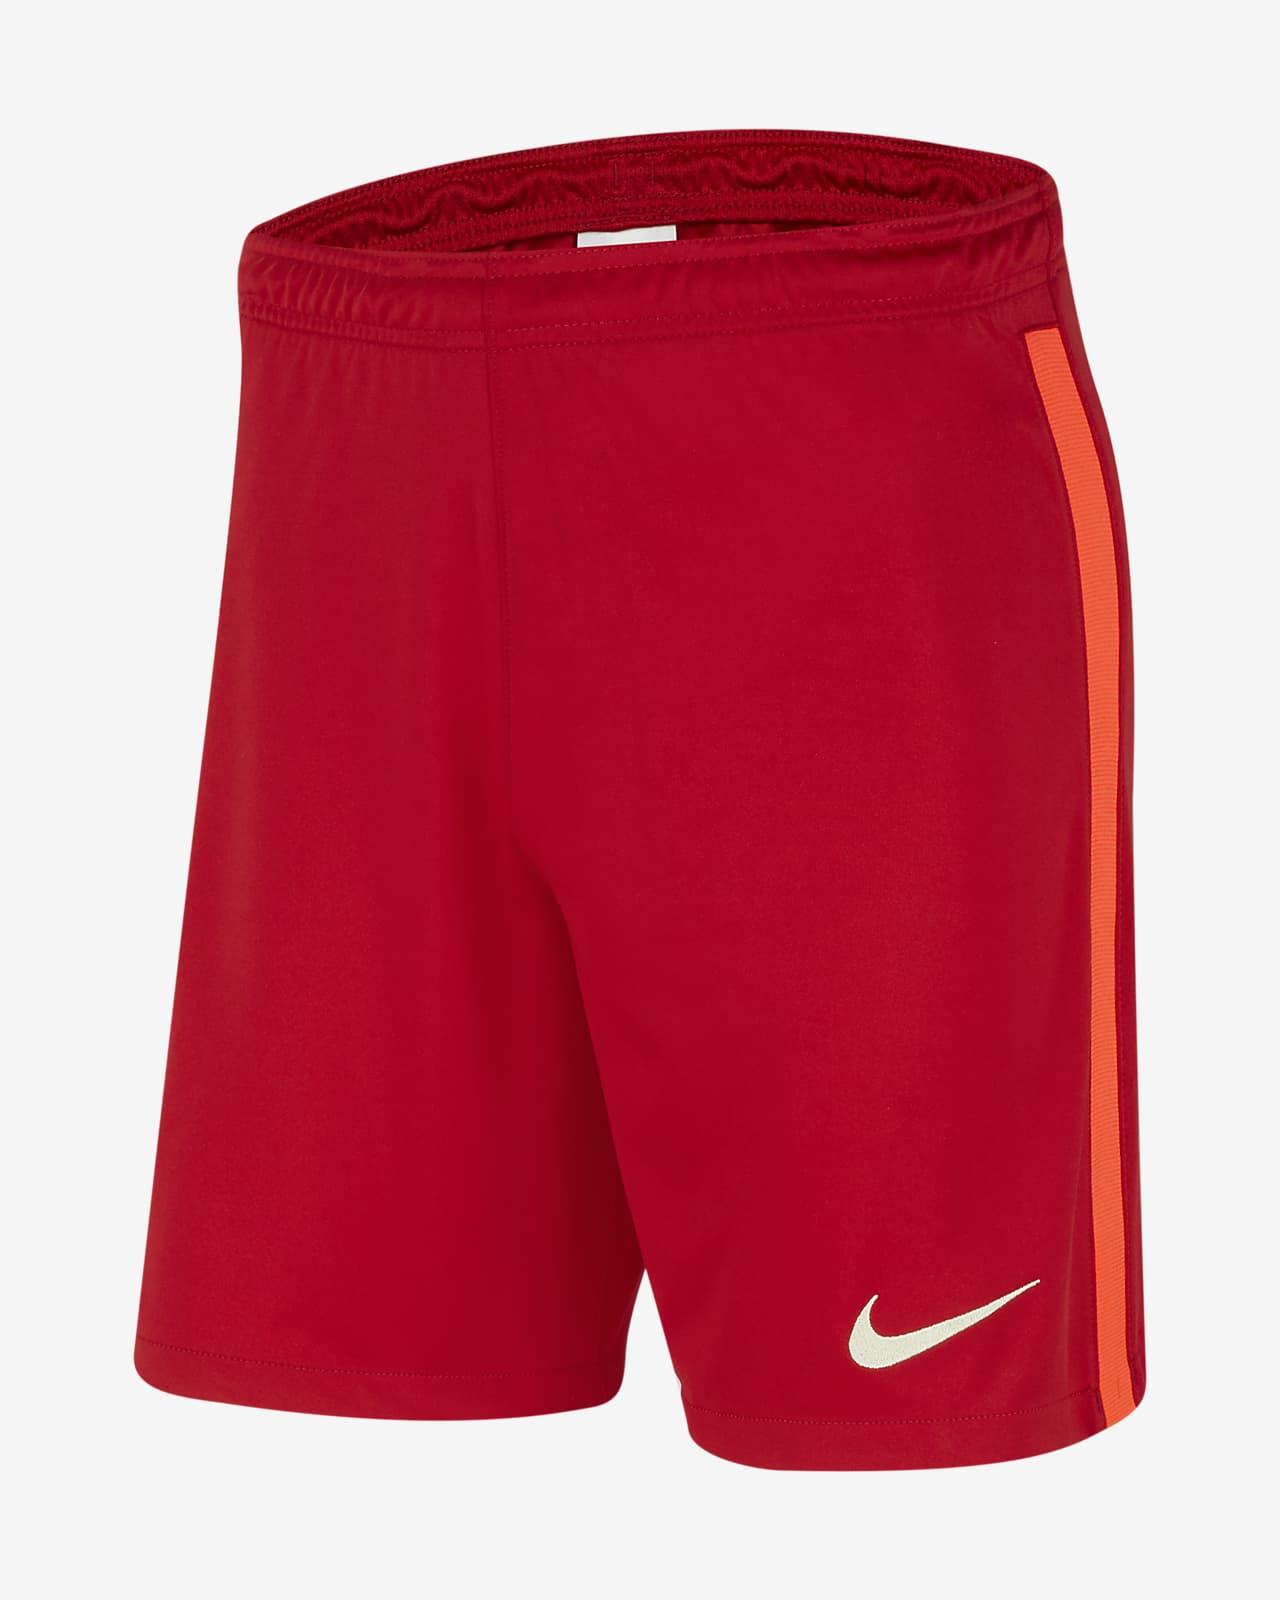 Liverpool F.C. 2021/22 Stadium Home Men's Football Shorts